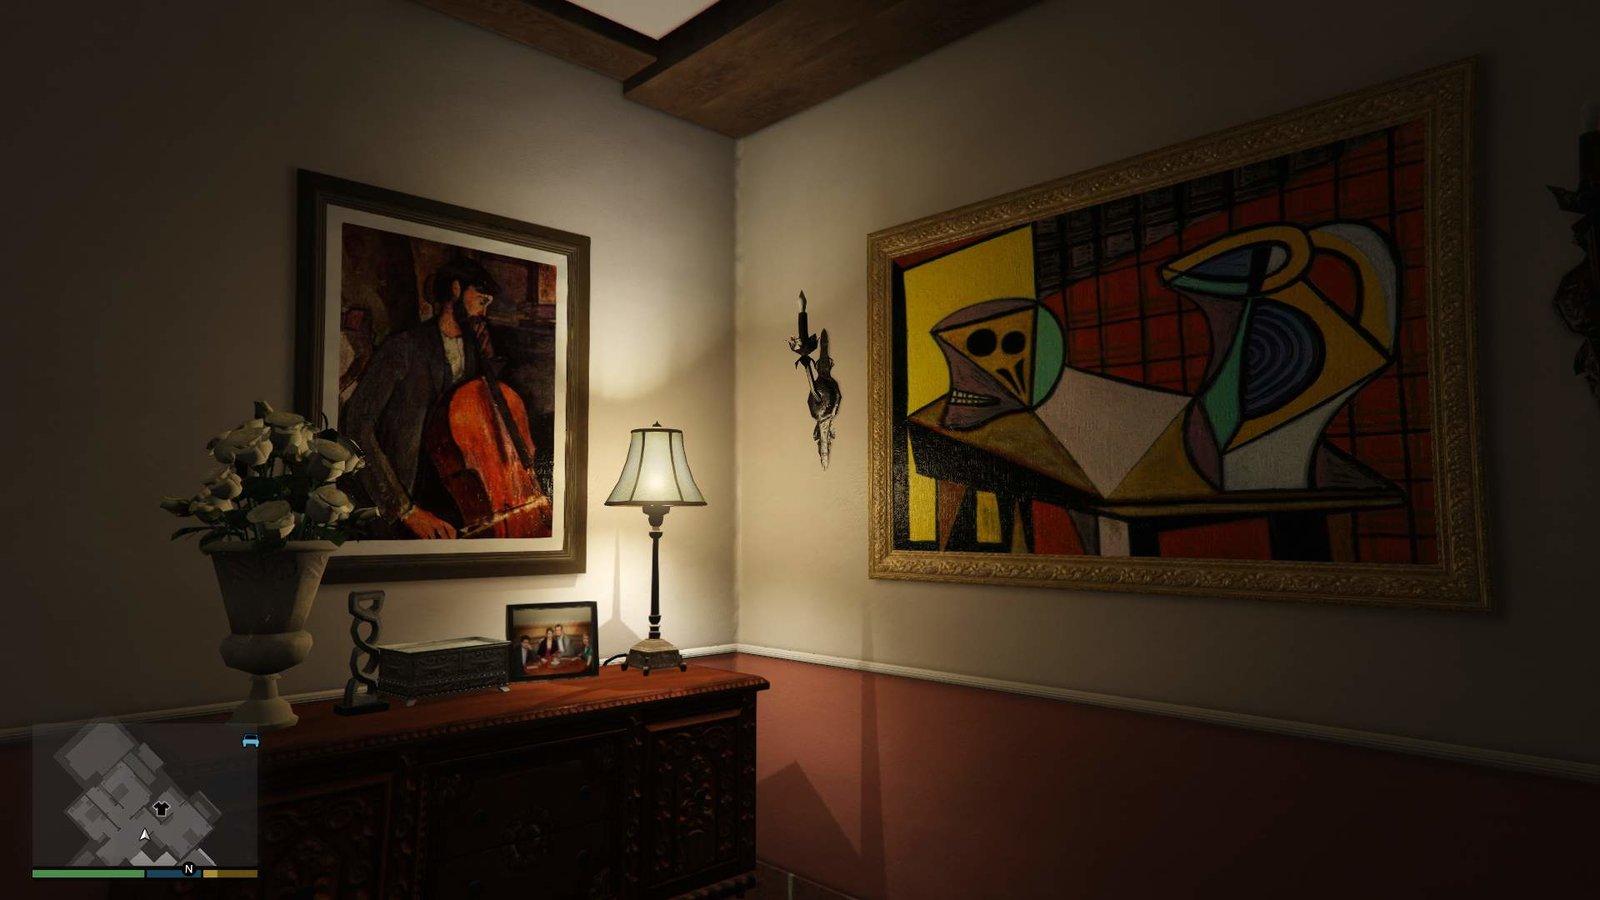 Chambre monster high tracey v 2 0 oeuvres d 39 art michael divers pour gta v sur gta modding - Accessoire monster high pour chambre ...